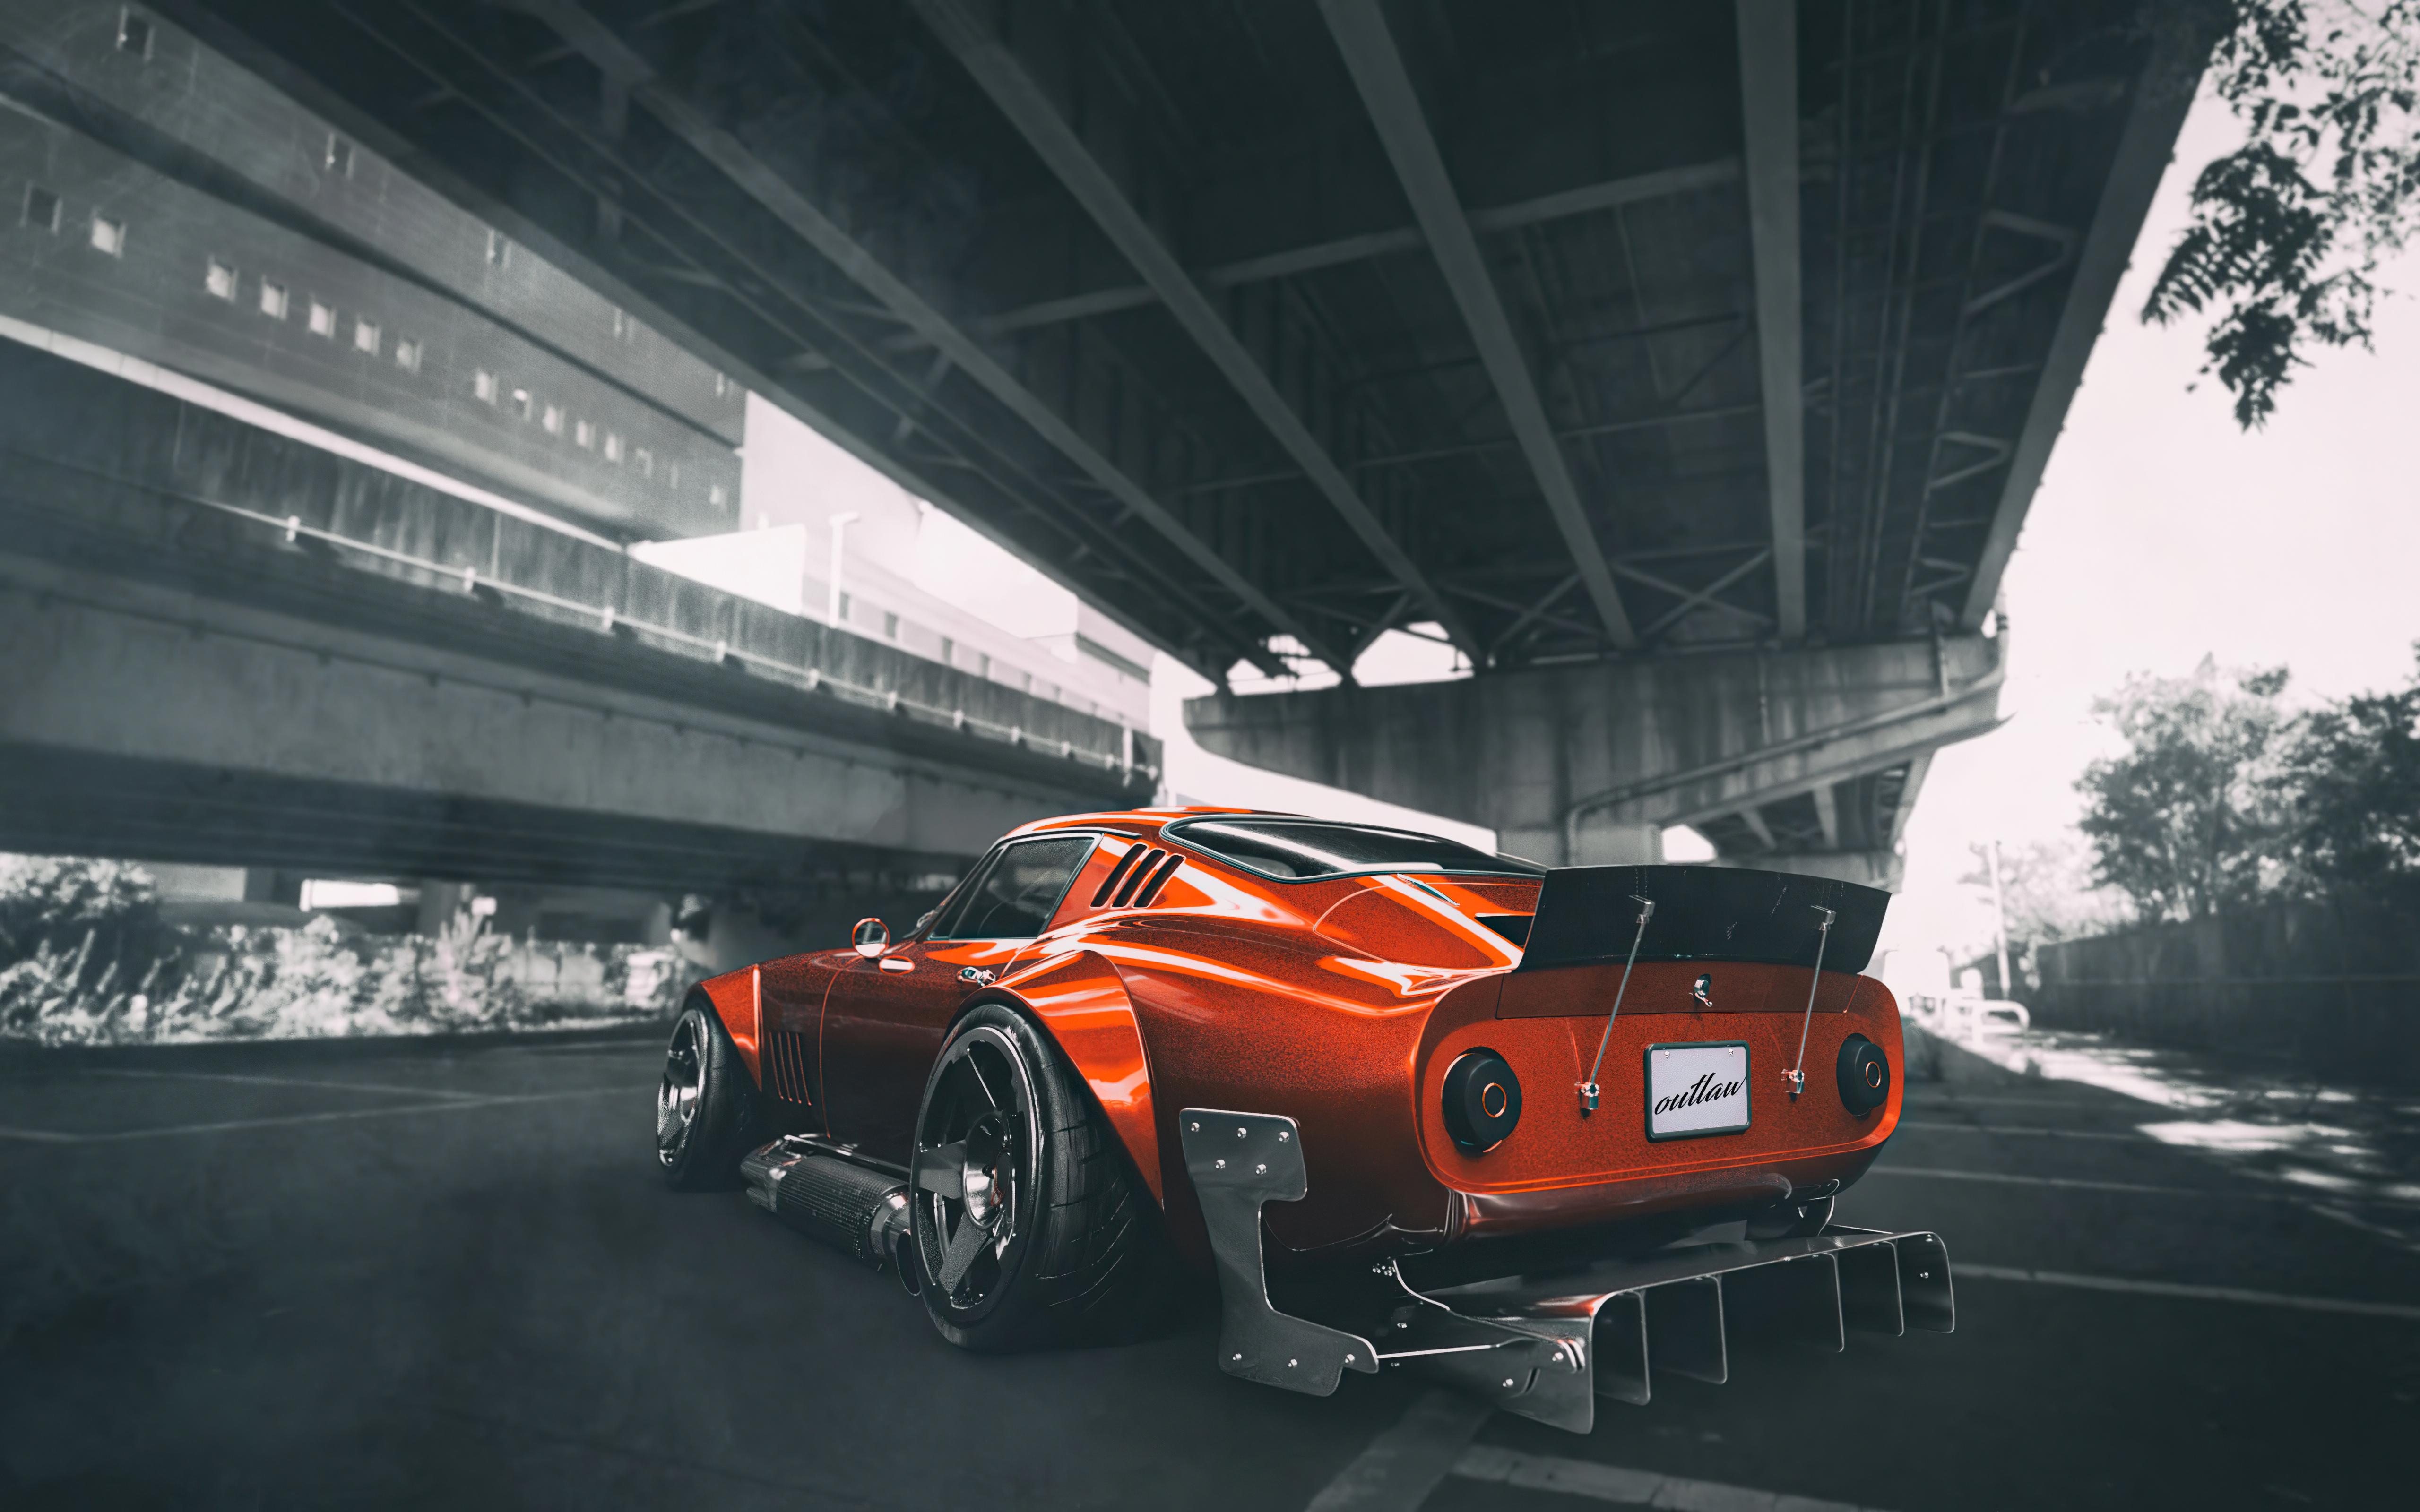 ferrari 275 gtb 4k 1620170853 - Ferrari 275 Gtb 4k - Ferrari 275 Gtb 4k wallpapers